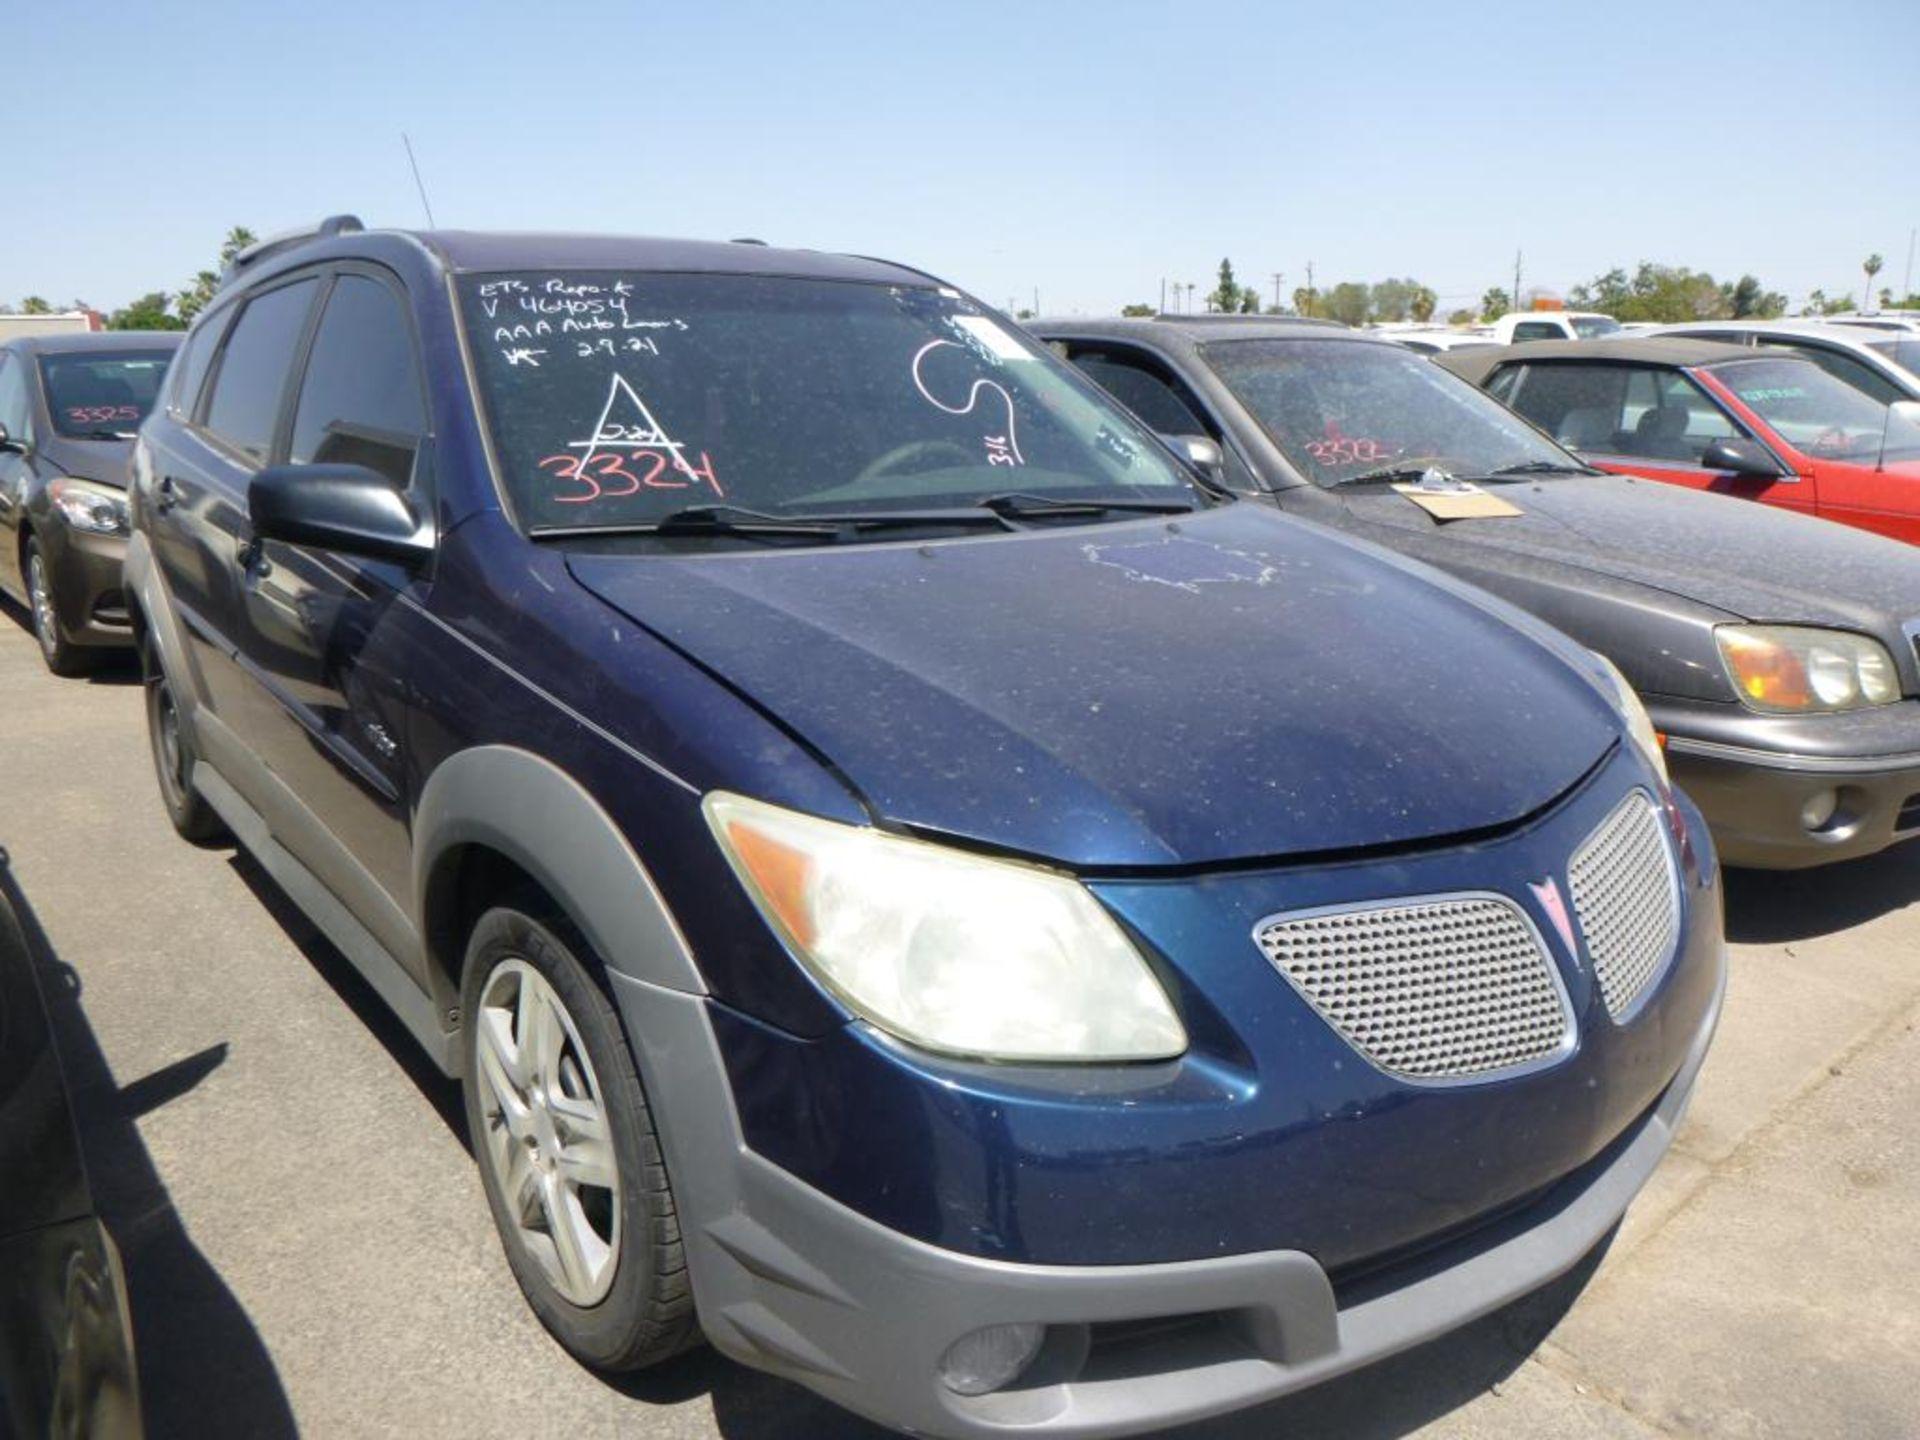 2006 Pontiac Vibe - Image 4 of 14